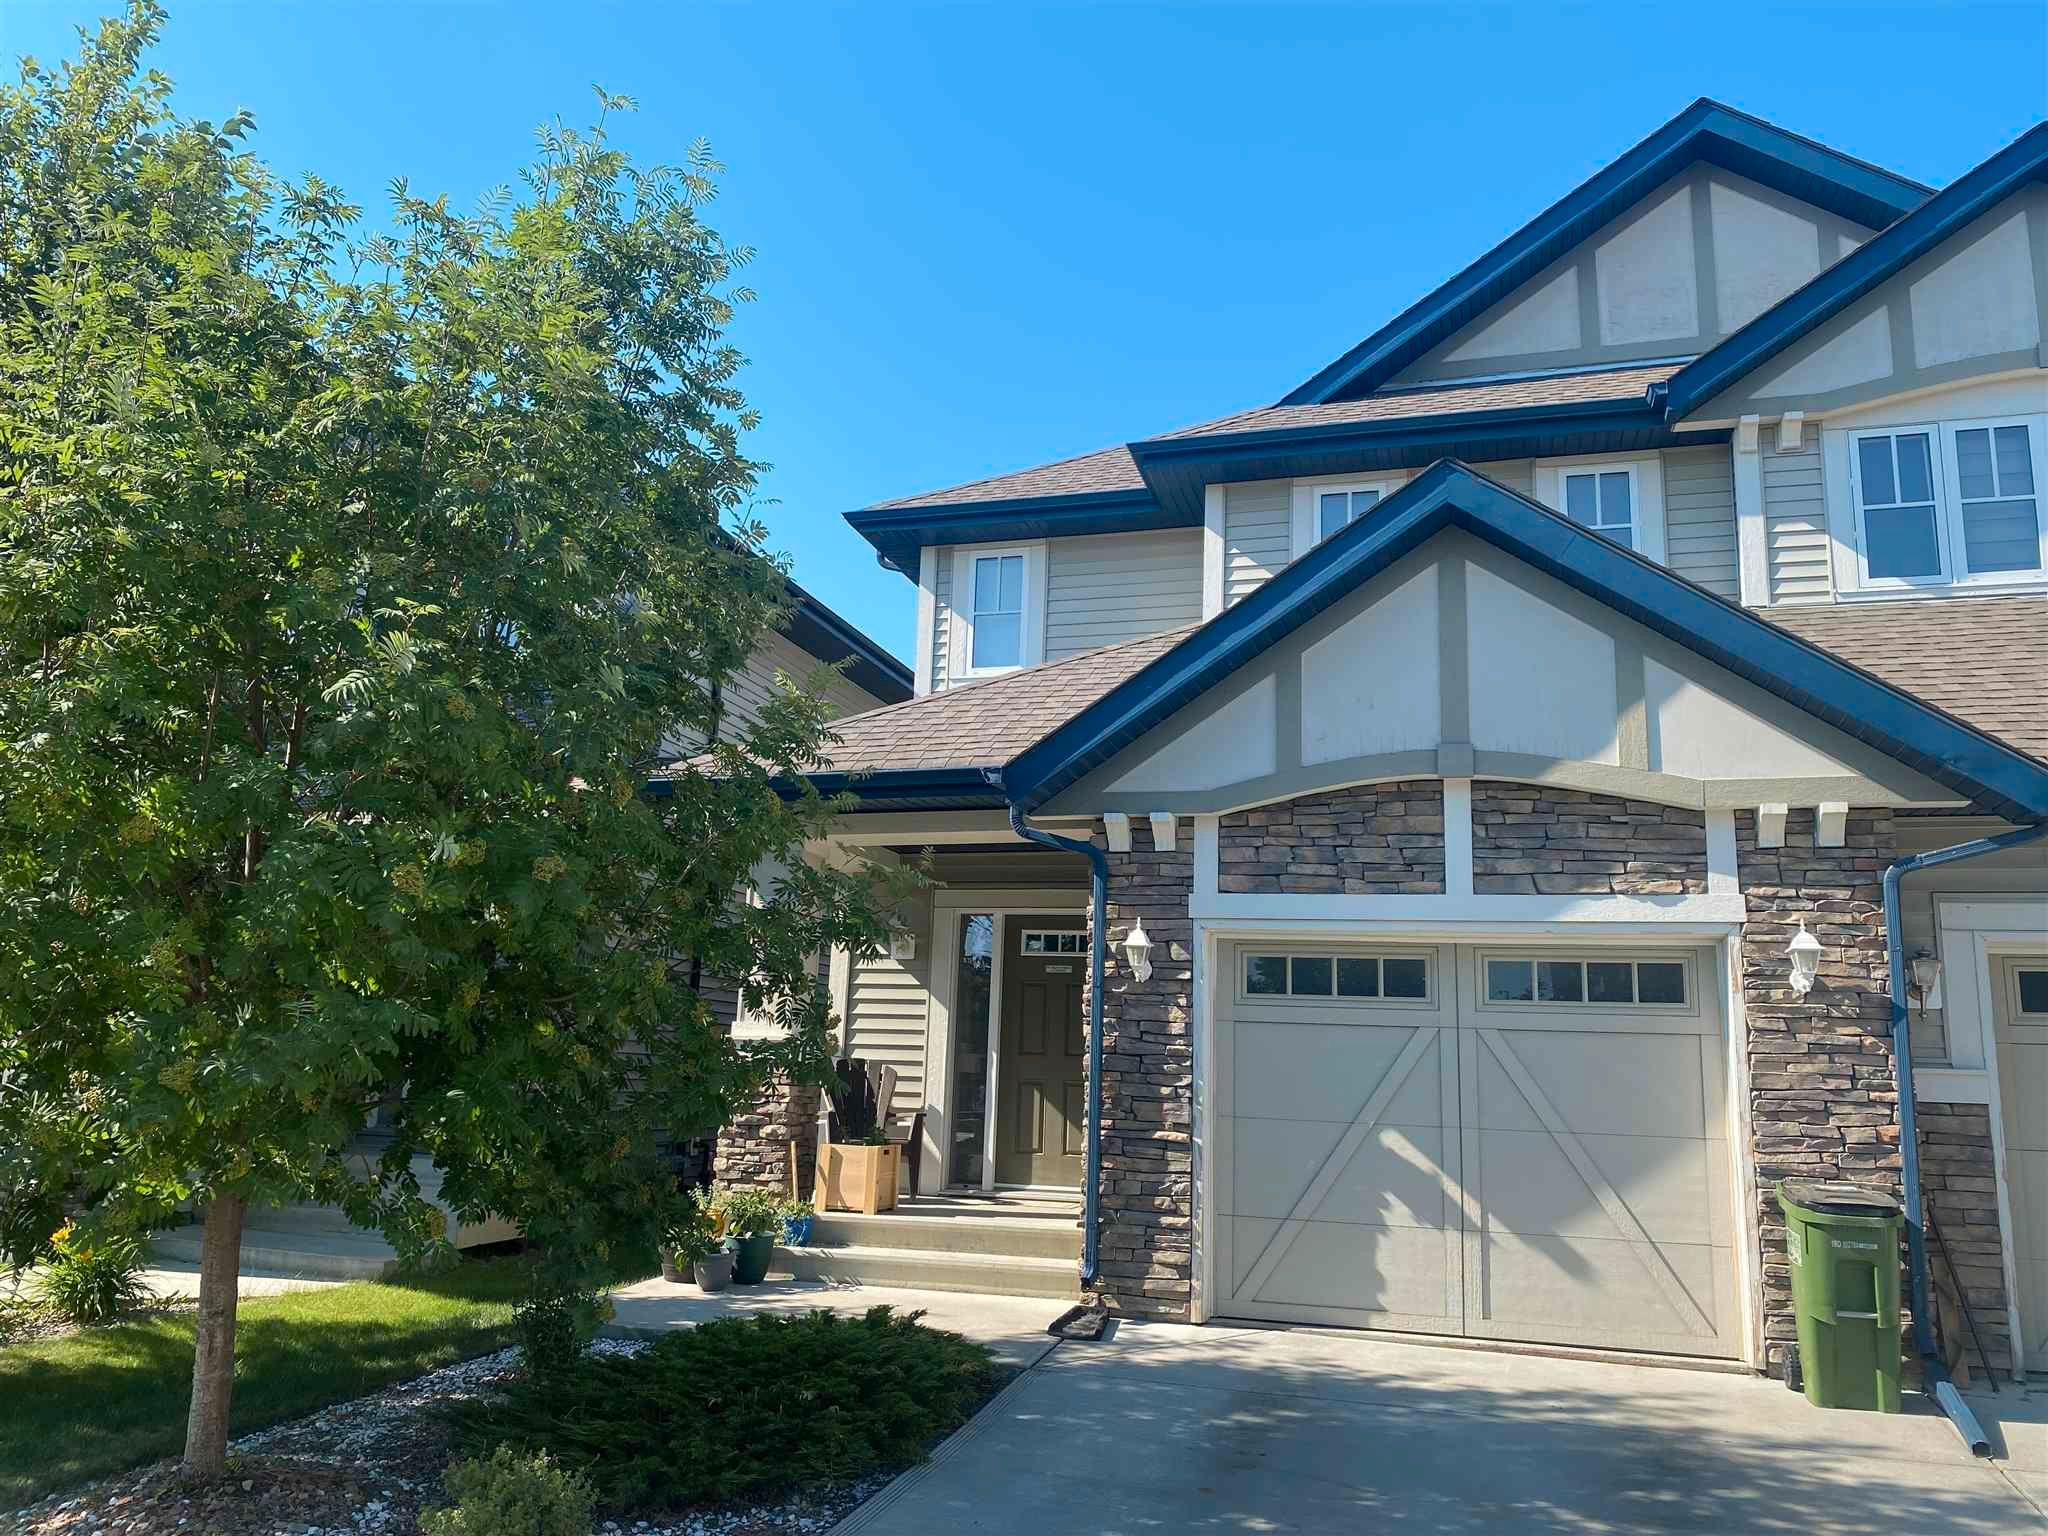 Main Photo: 2263 AUSTIN Way in Edmonton: Zone 56 House Half Duplex for sale : MLS®# E4252210